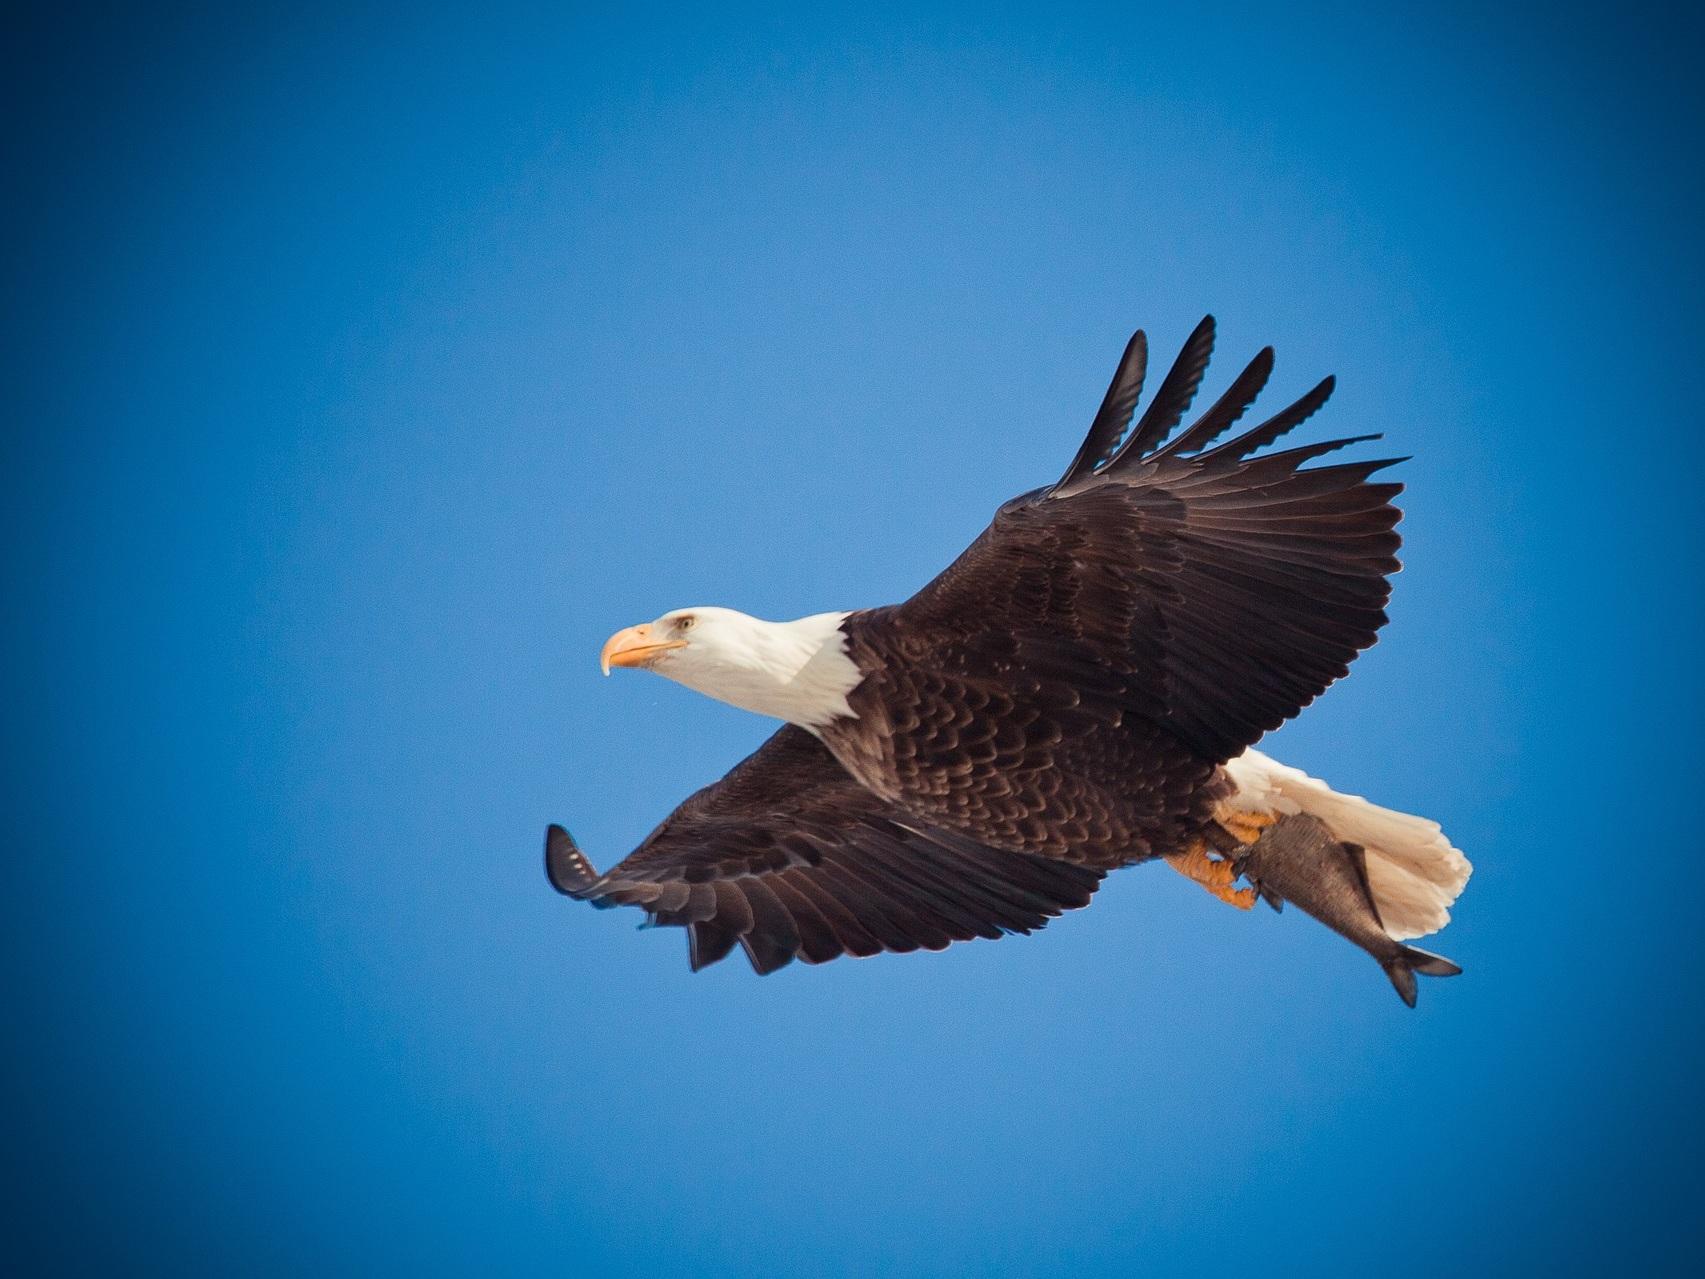 eagle-1029909_1920.jpg